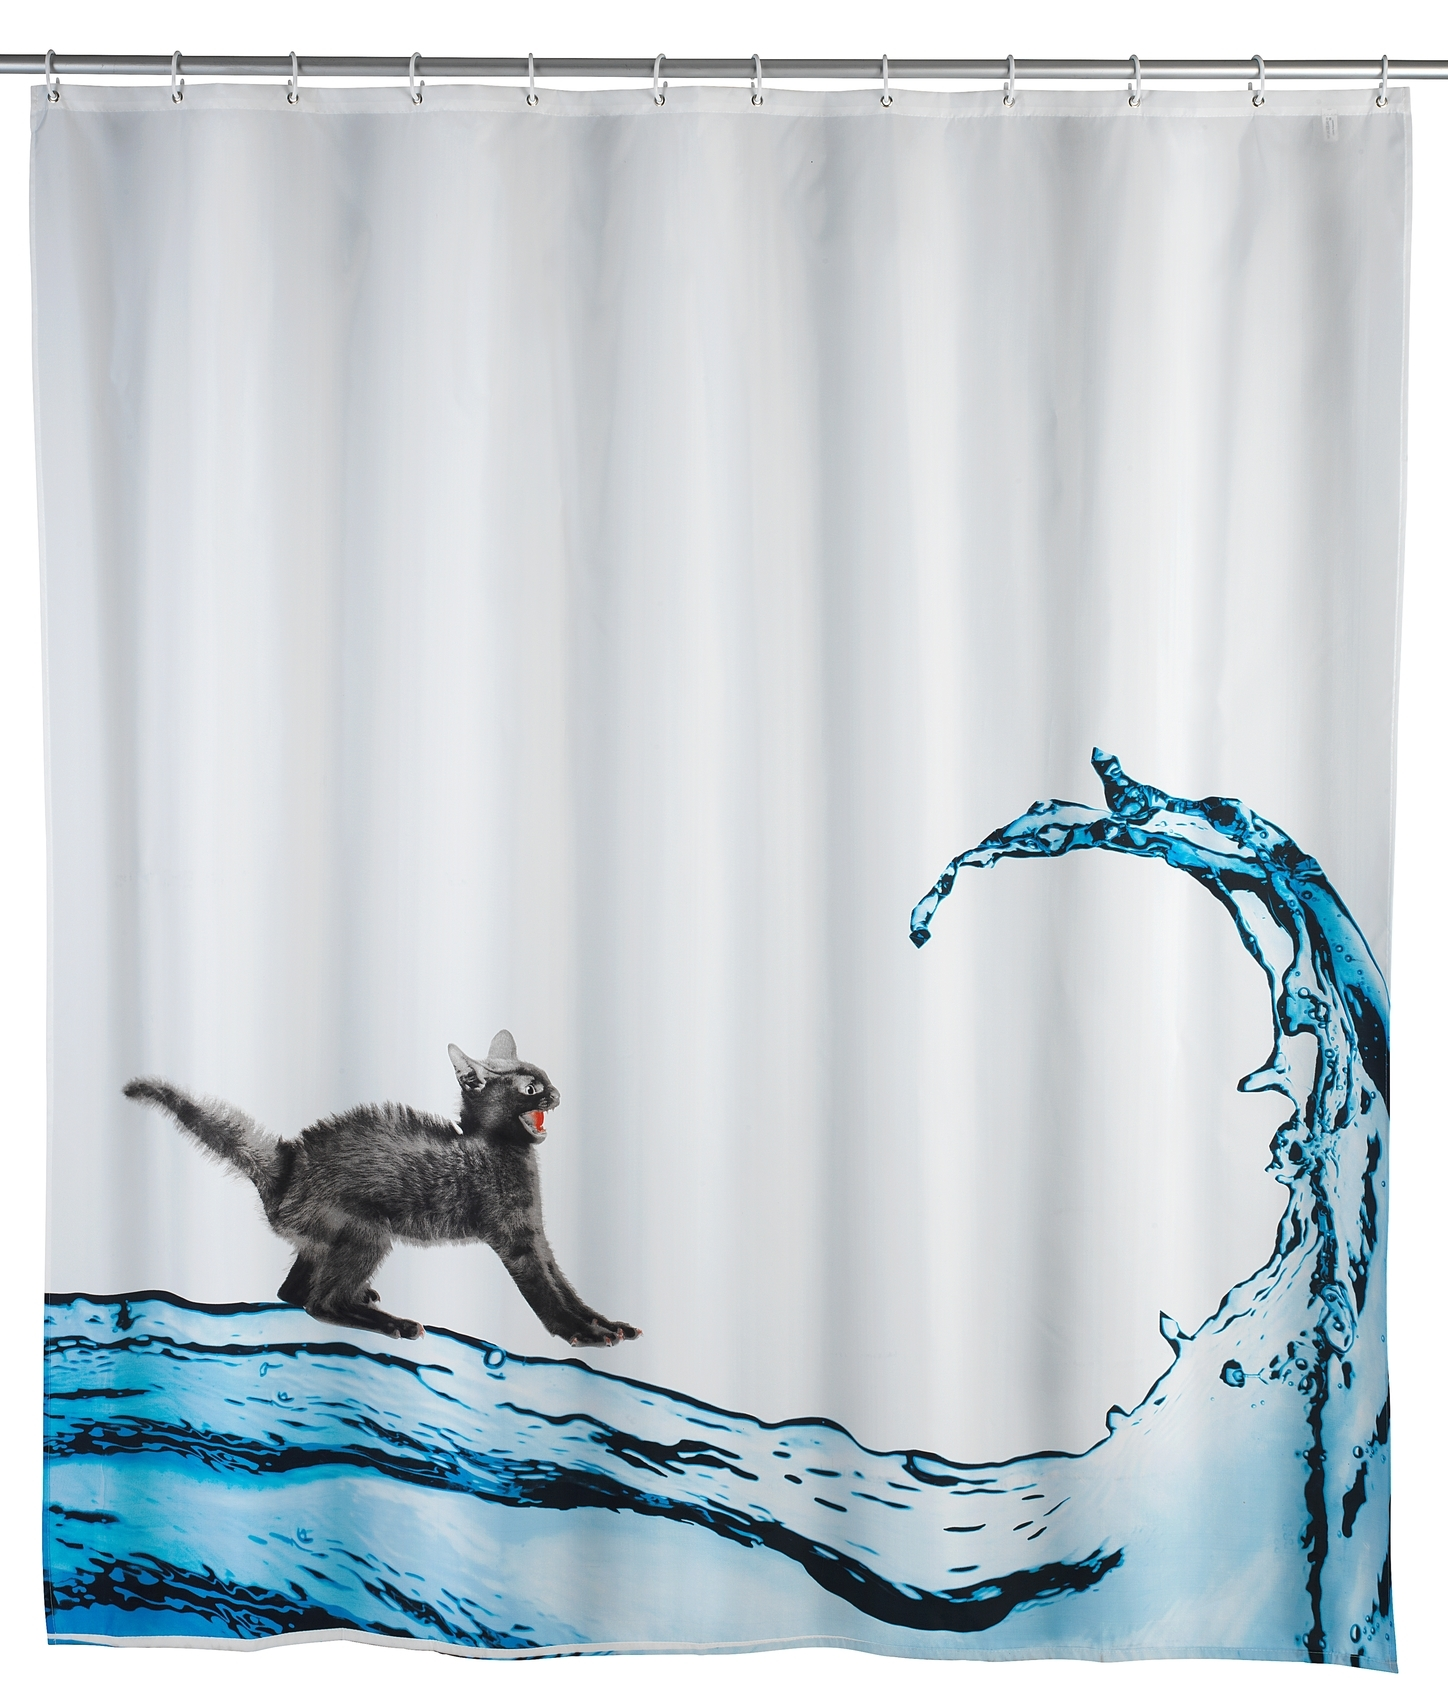 Perdea dus anti-mucegai din poliester, Cat Alb, 180 x 200 cm imagine